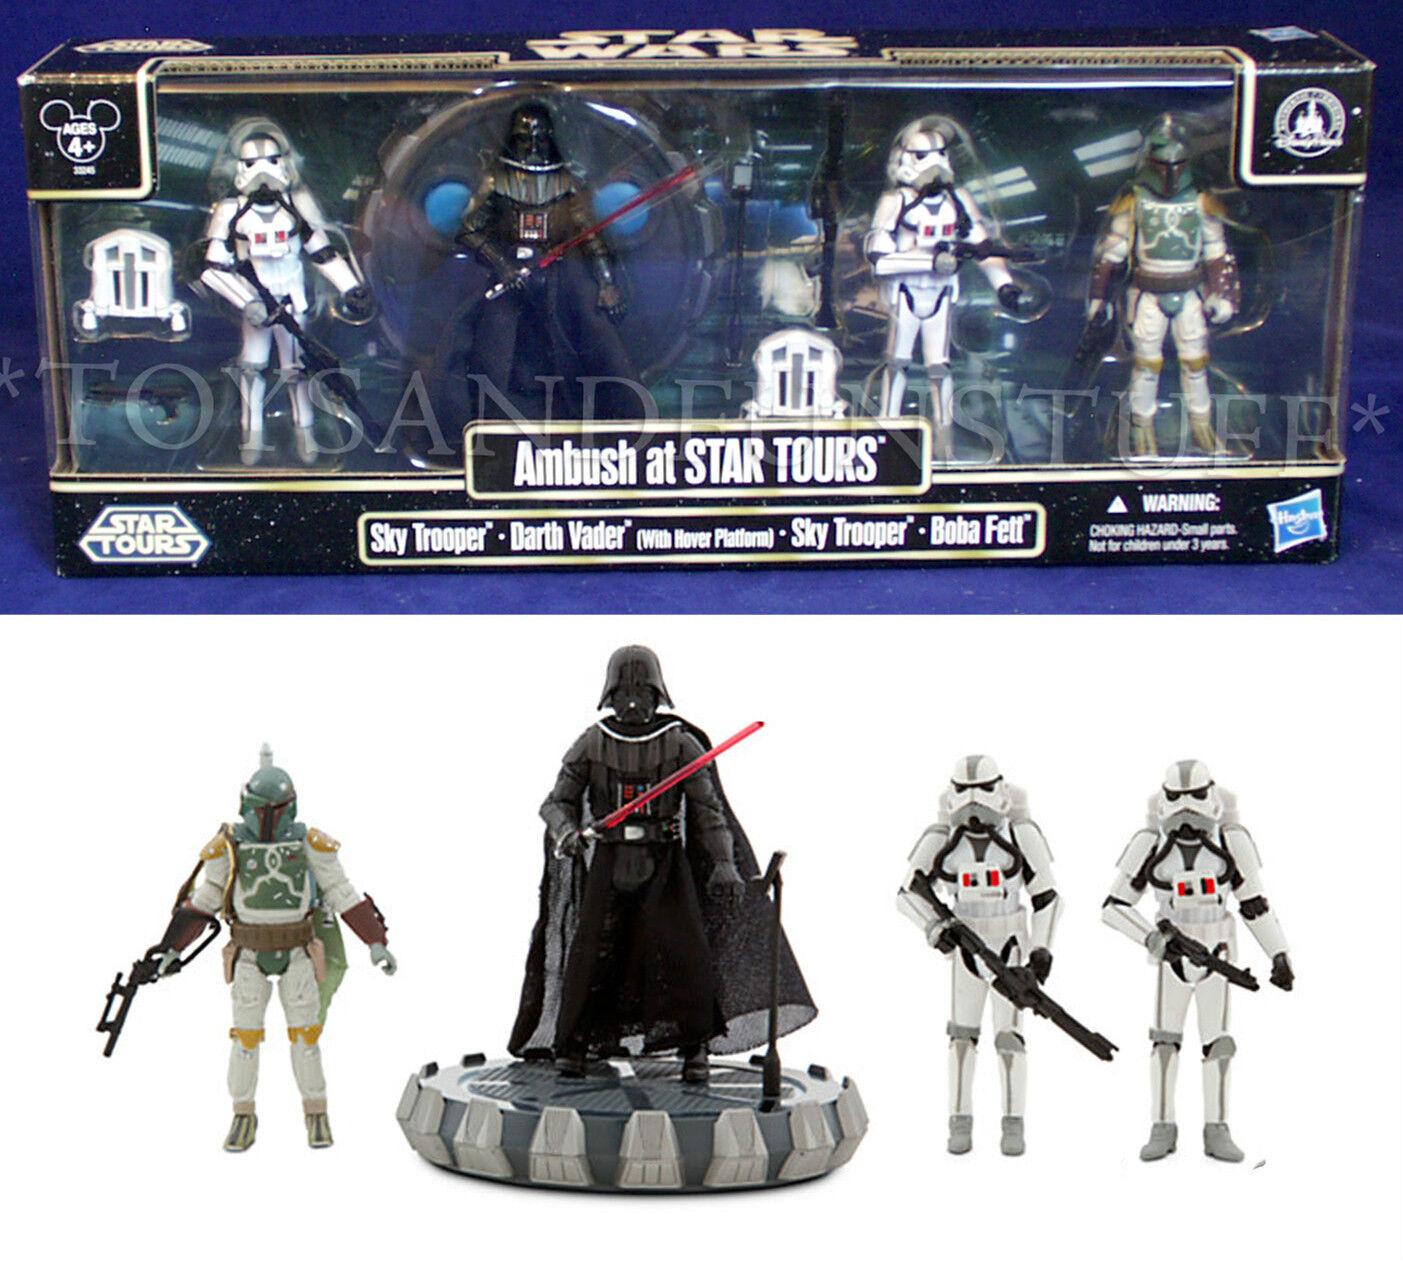 Nuevo-Emboscada en Star Tours - 4-Pack cielo Troopers Darth Vader Star Wars Boba Fett